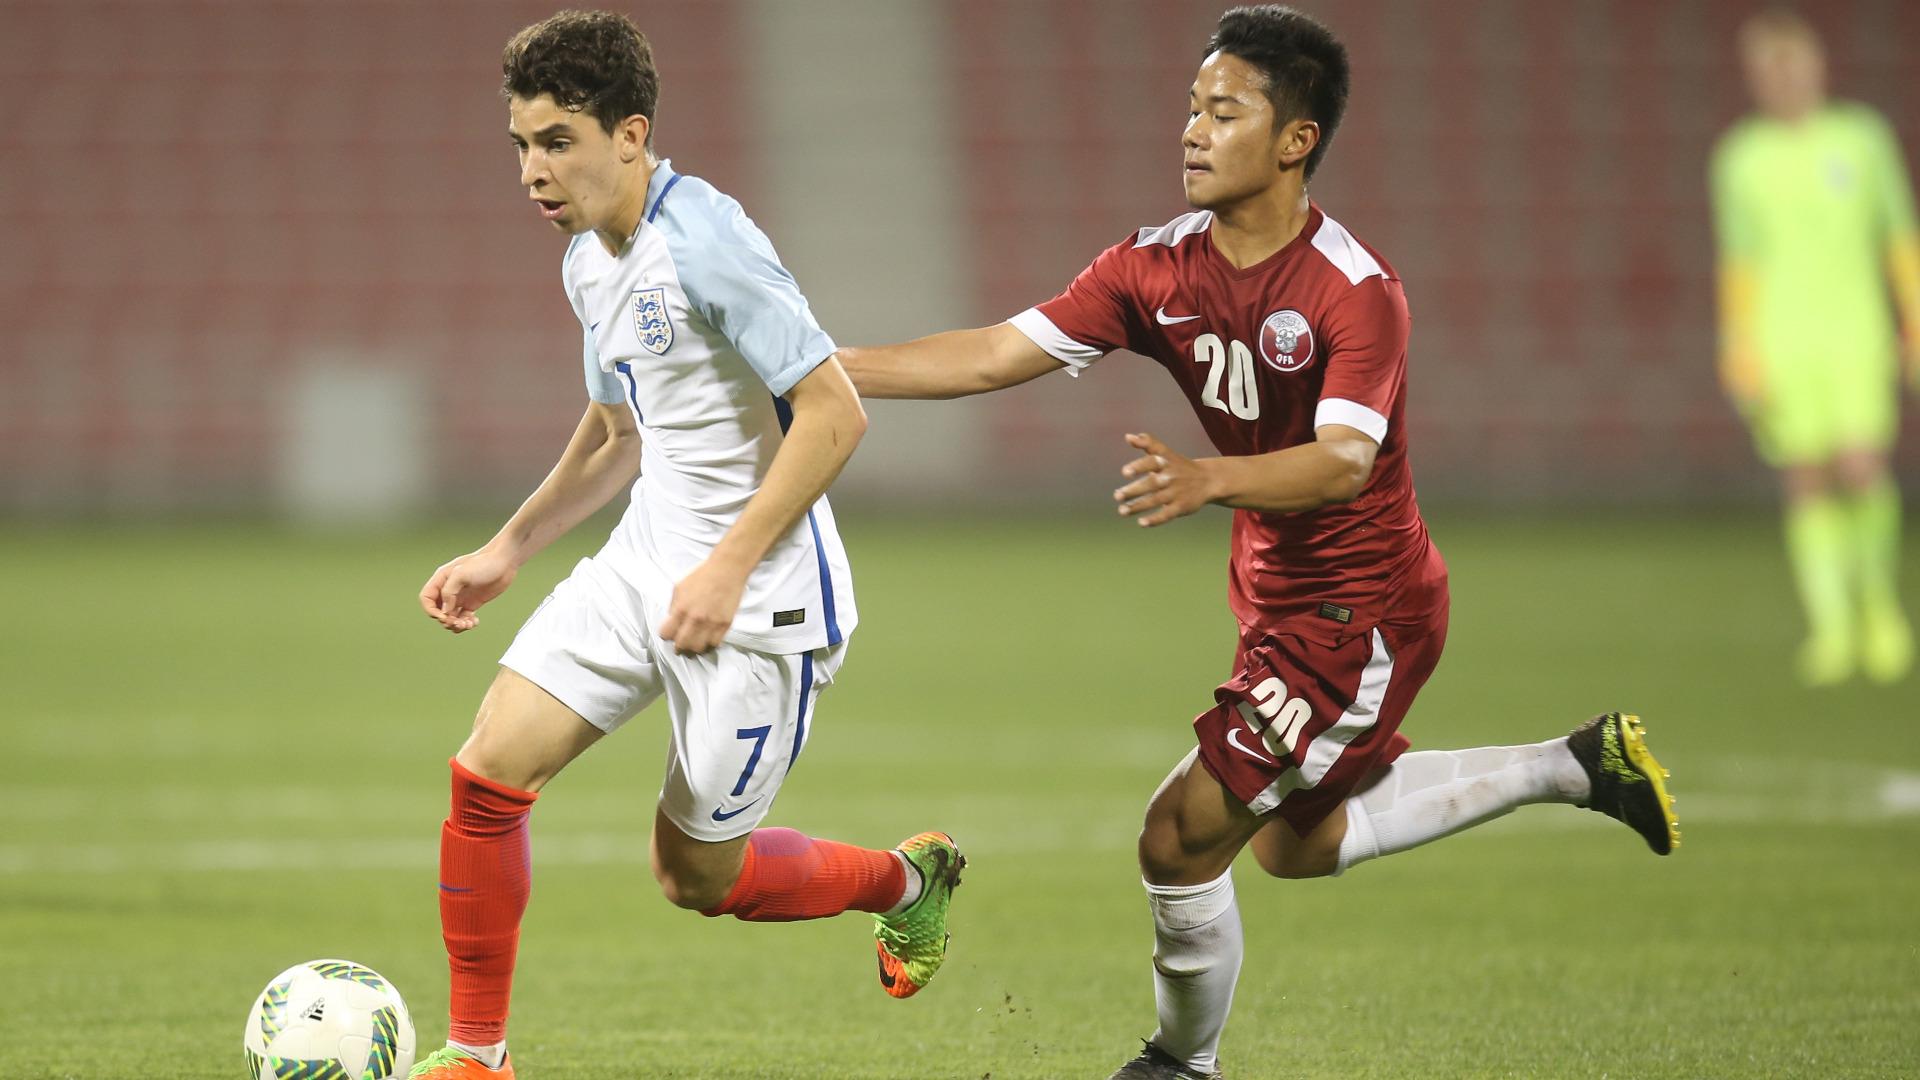 Samuel Shashoua & Andri Syahputra - Inggris U-18 & Qatar U-18